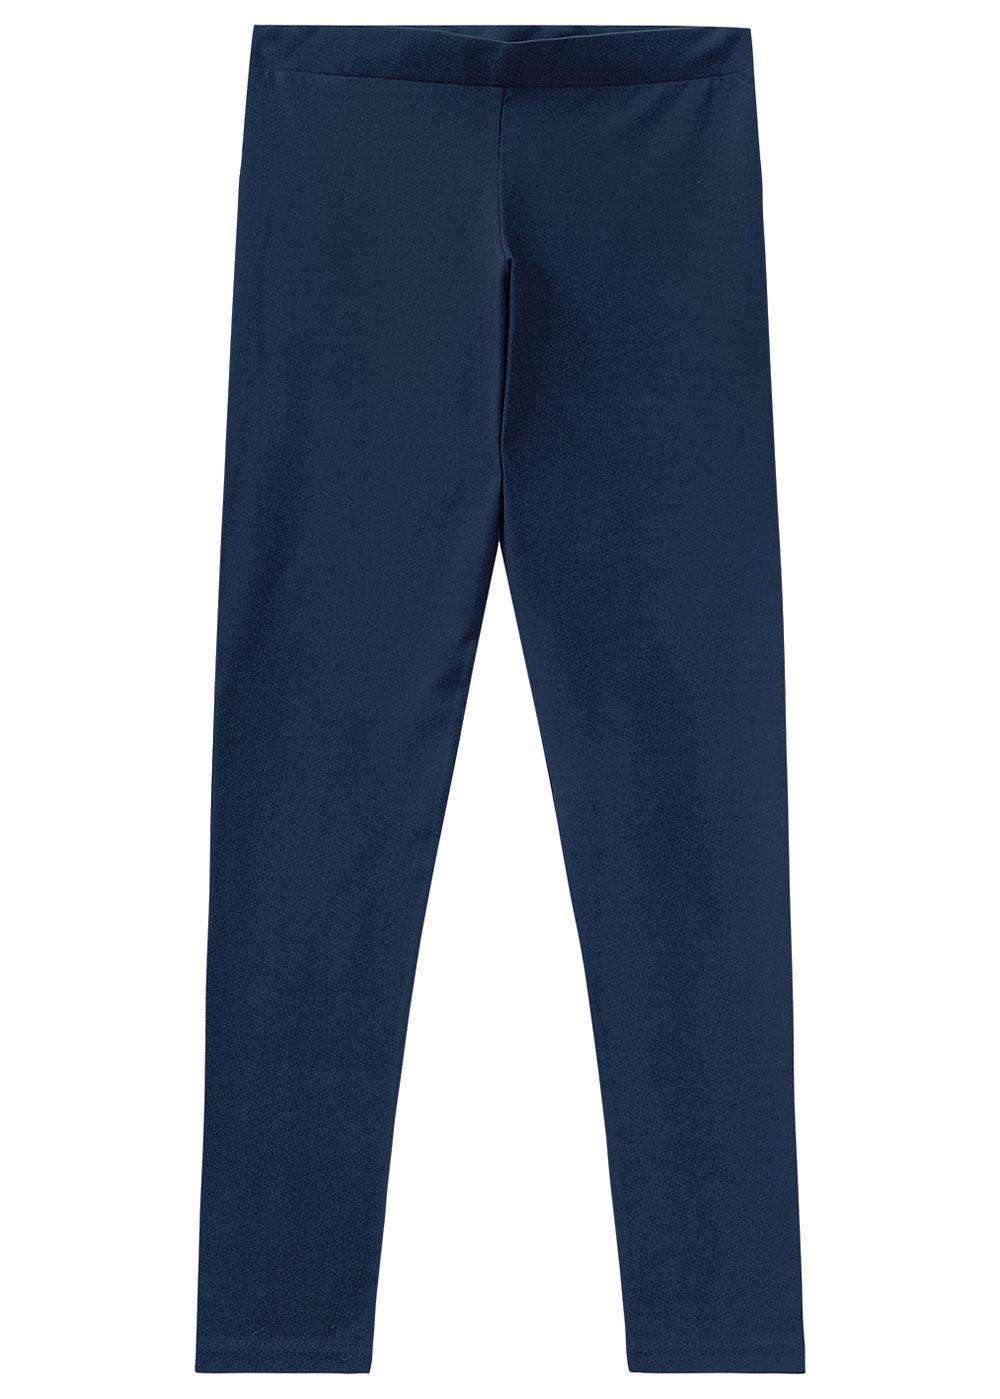 Calça Legging Adulto Feminina Azul Inverno Malwee